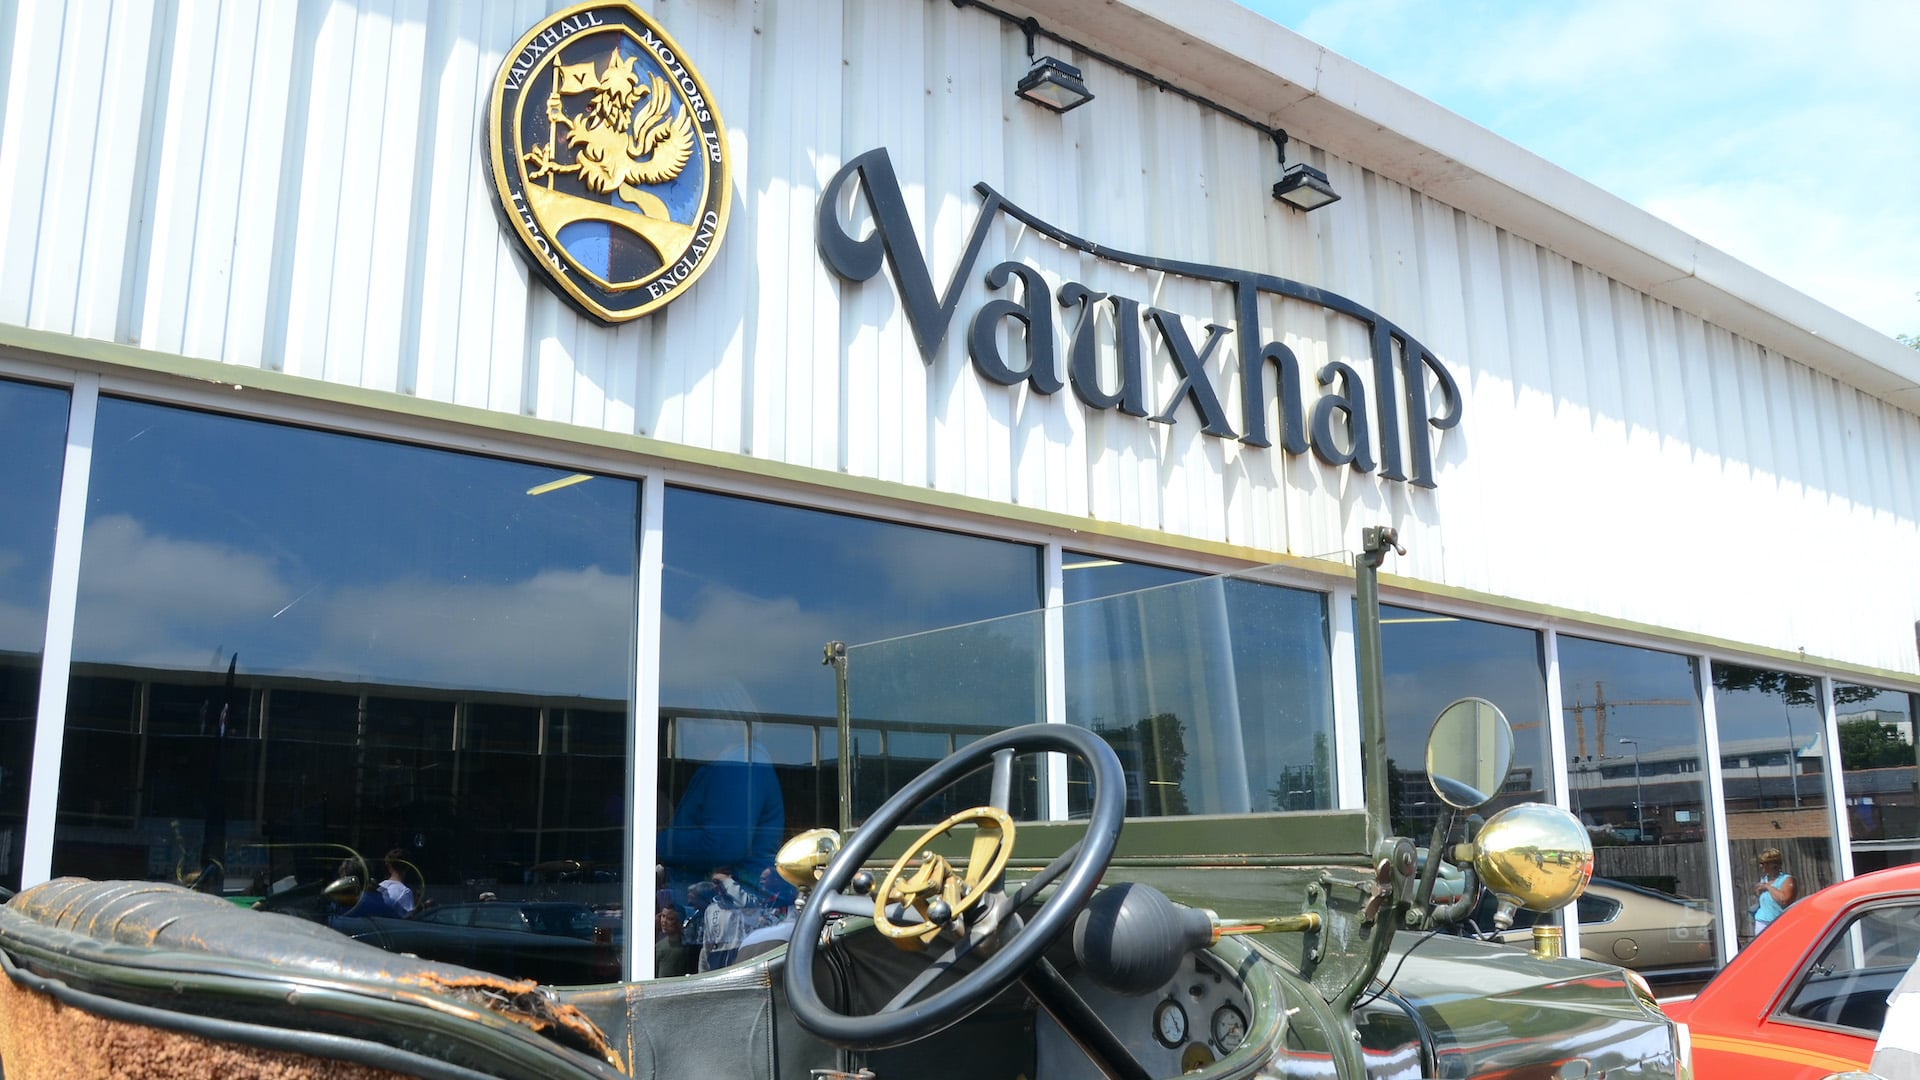 Vauxhall Heritage Luton Exhibition